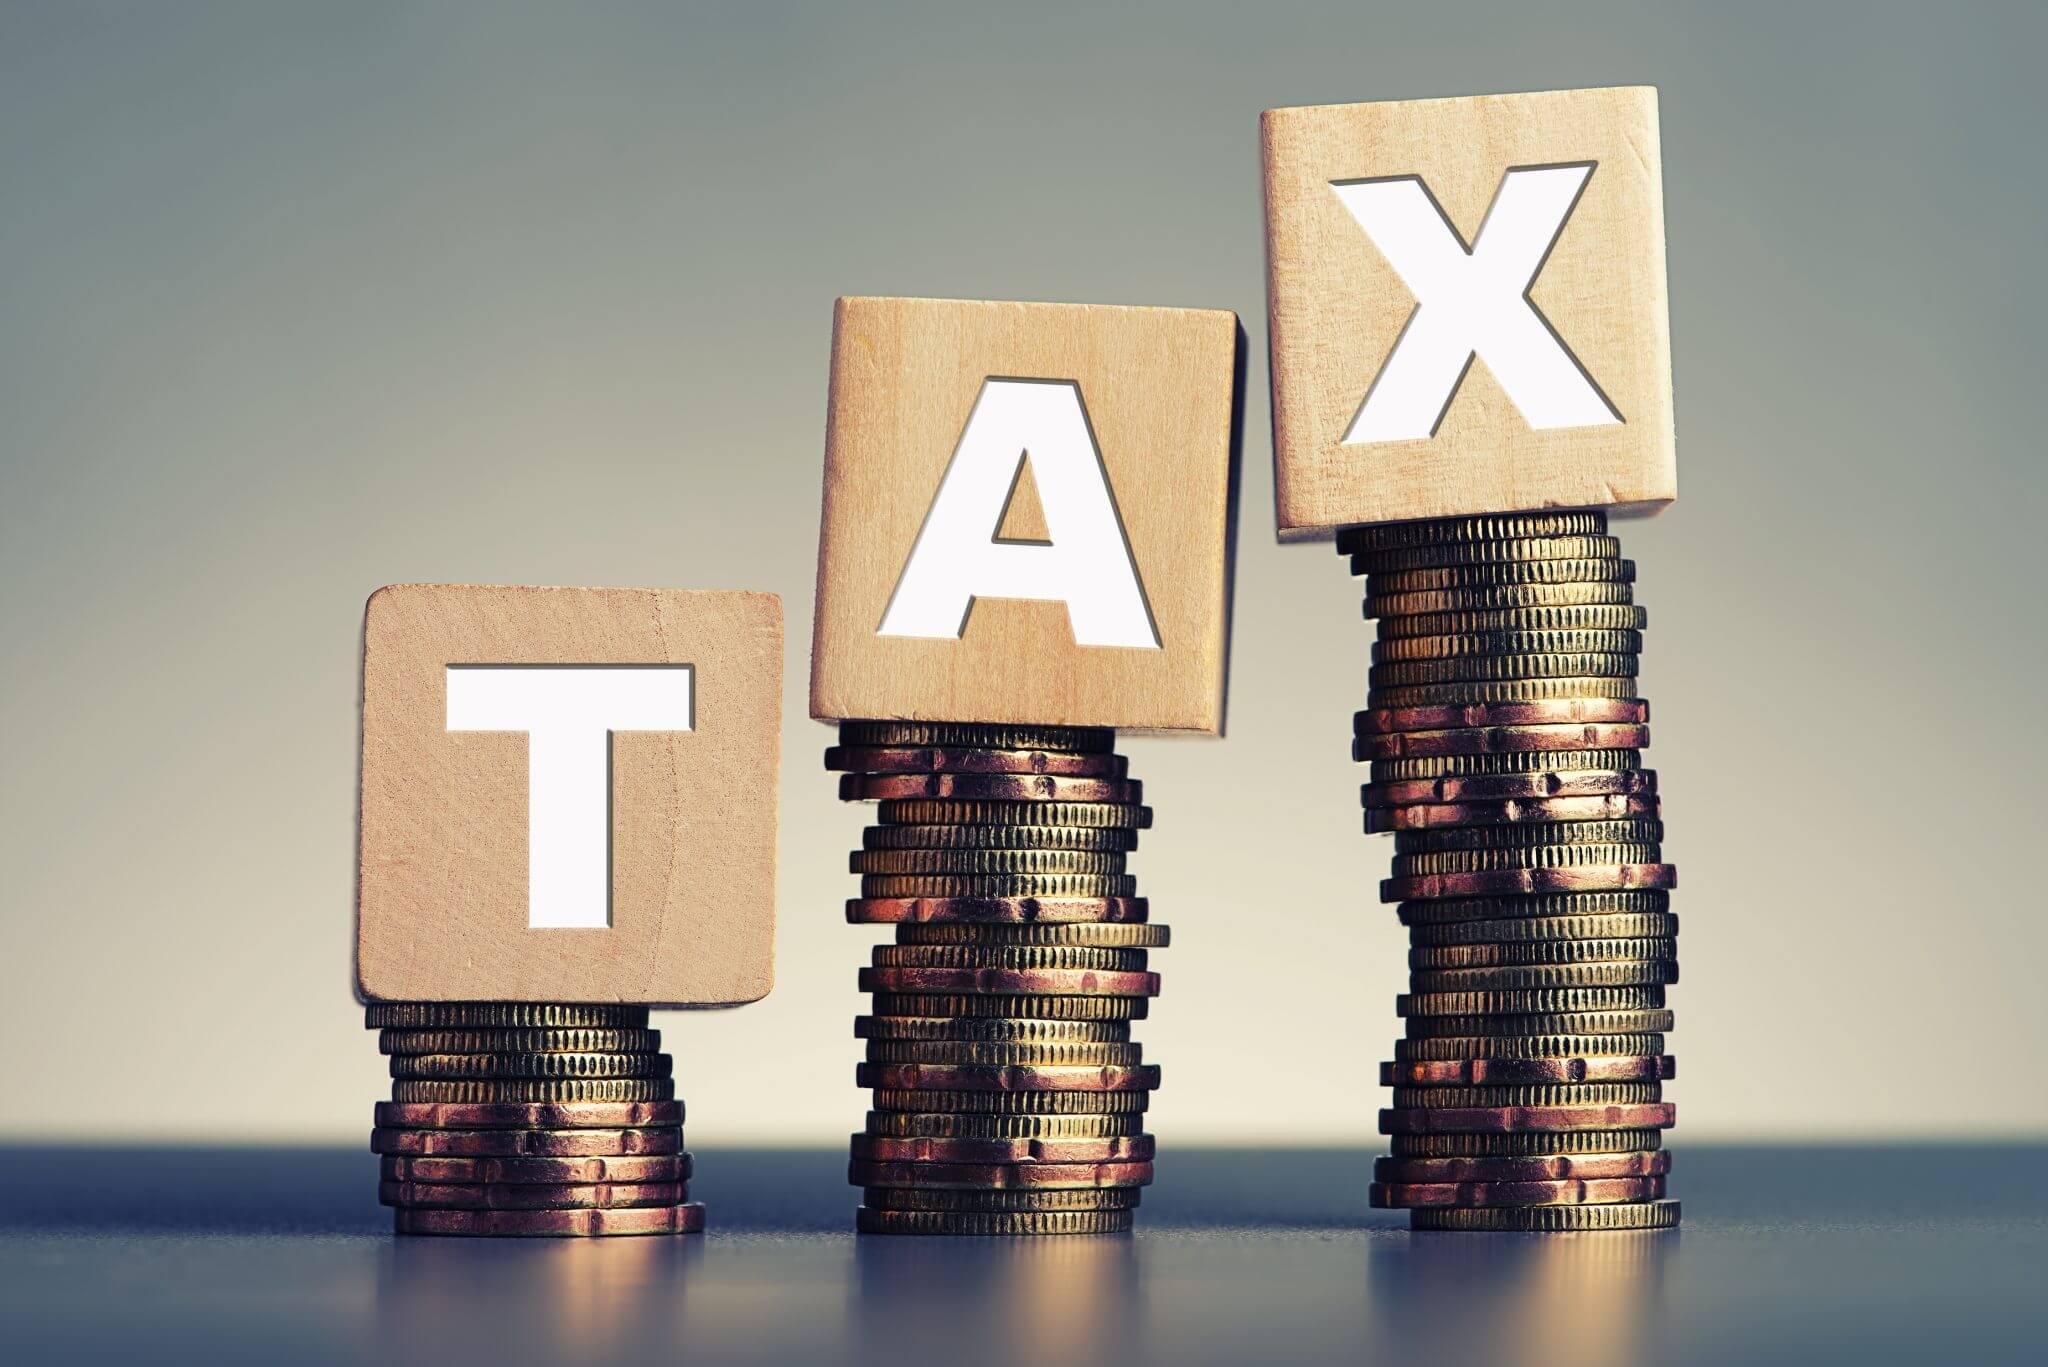 Digital currency taxation